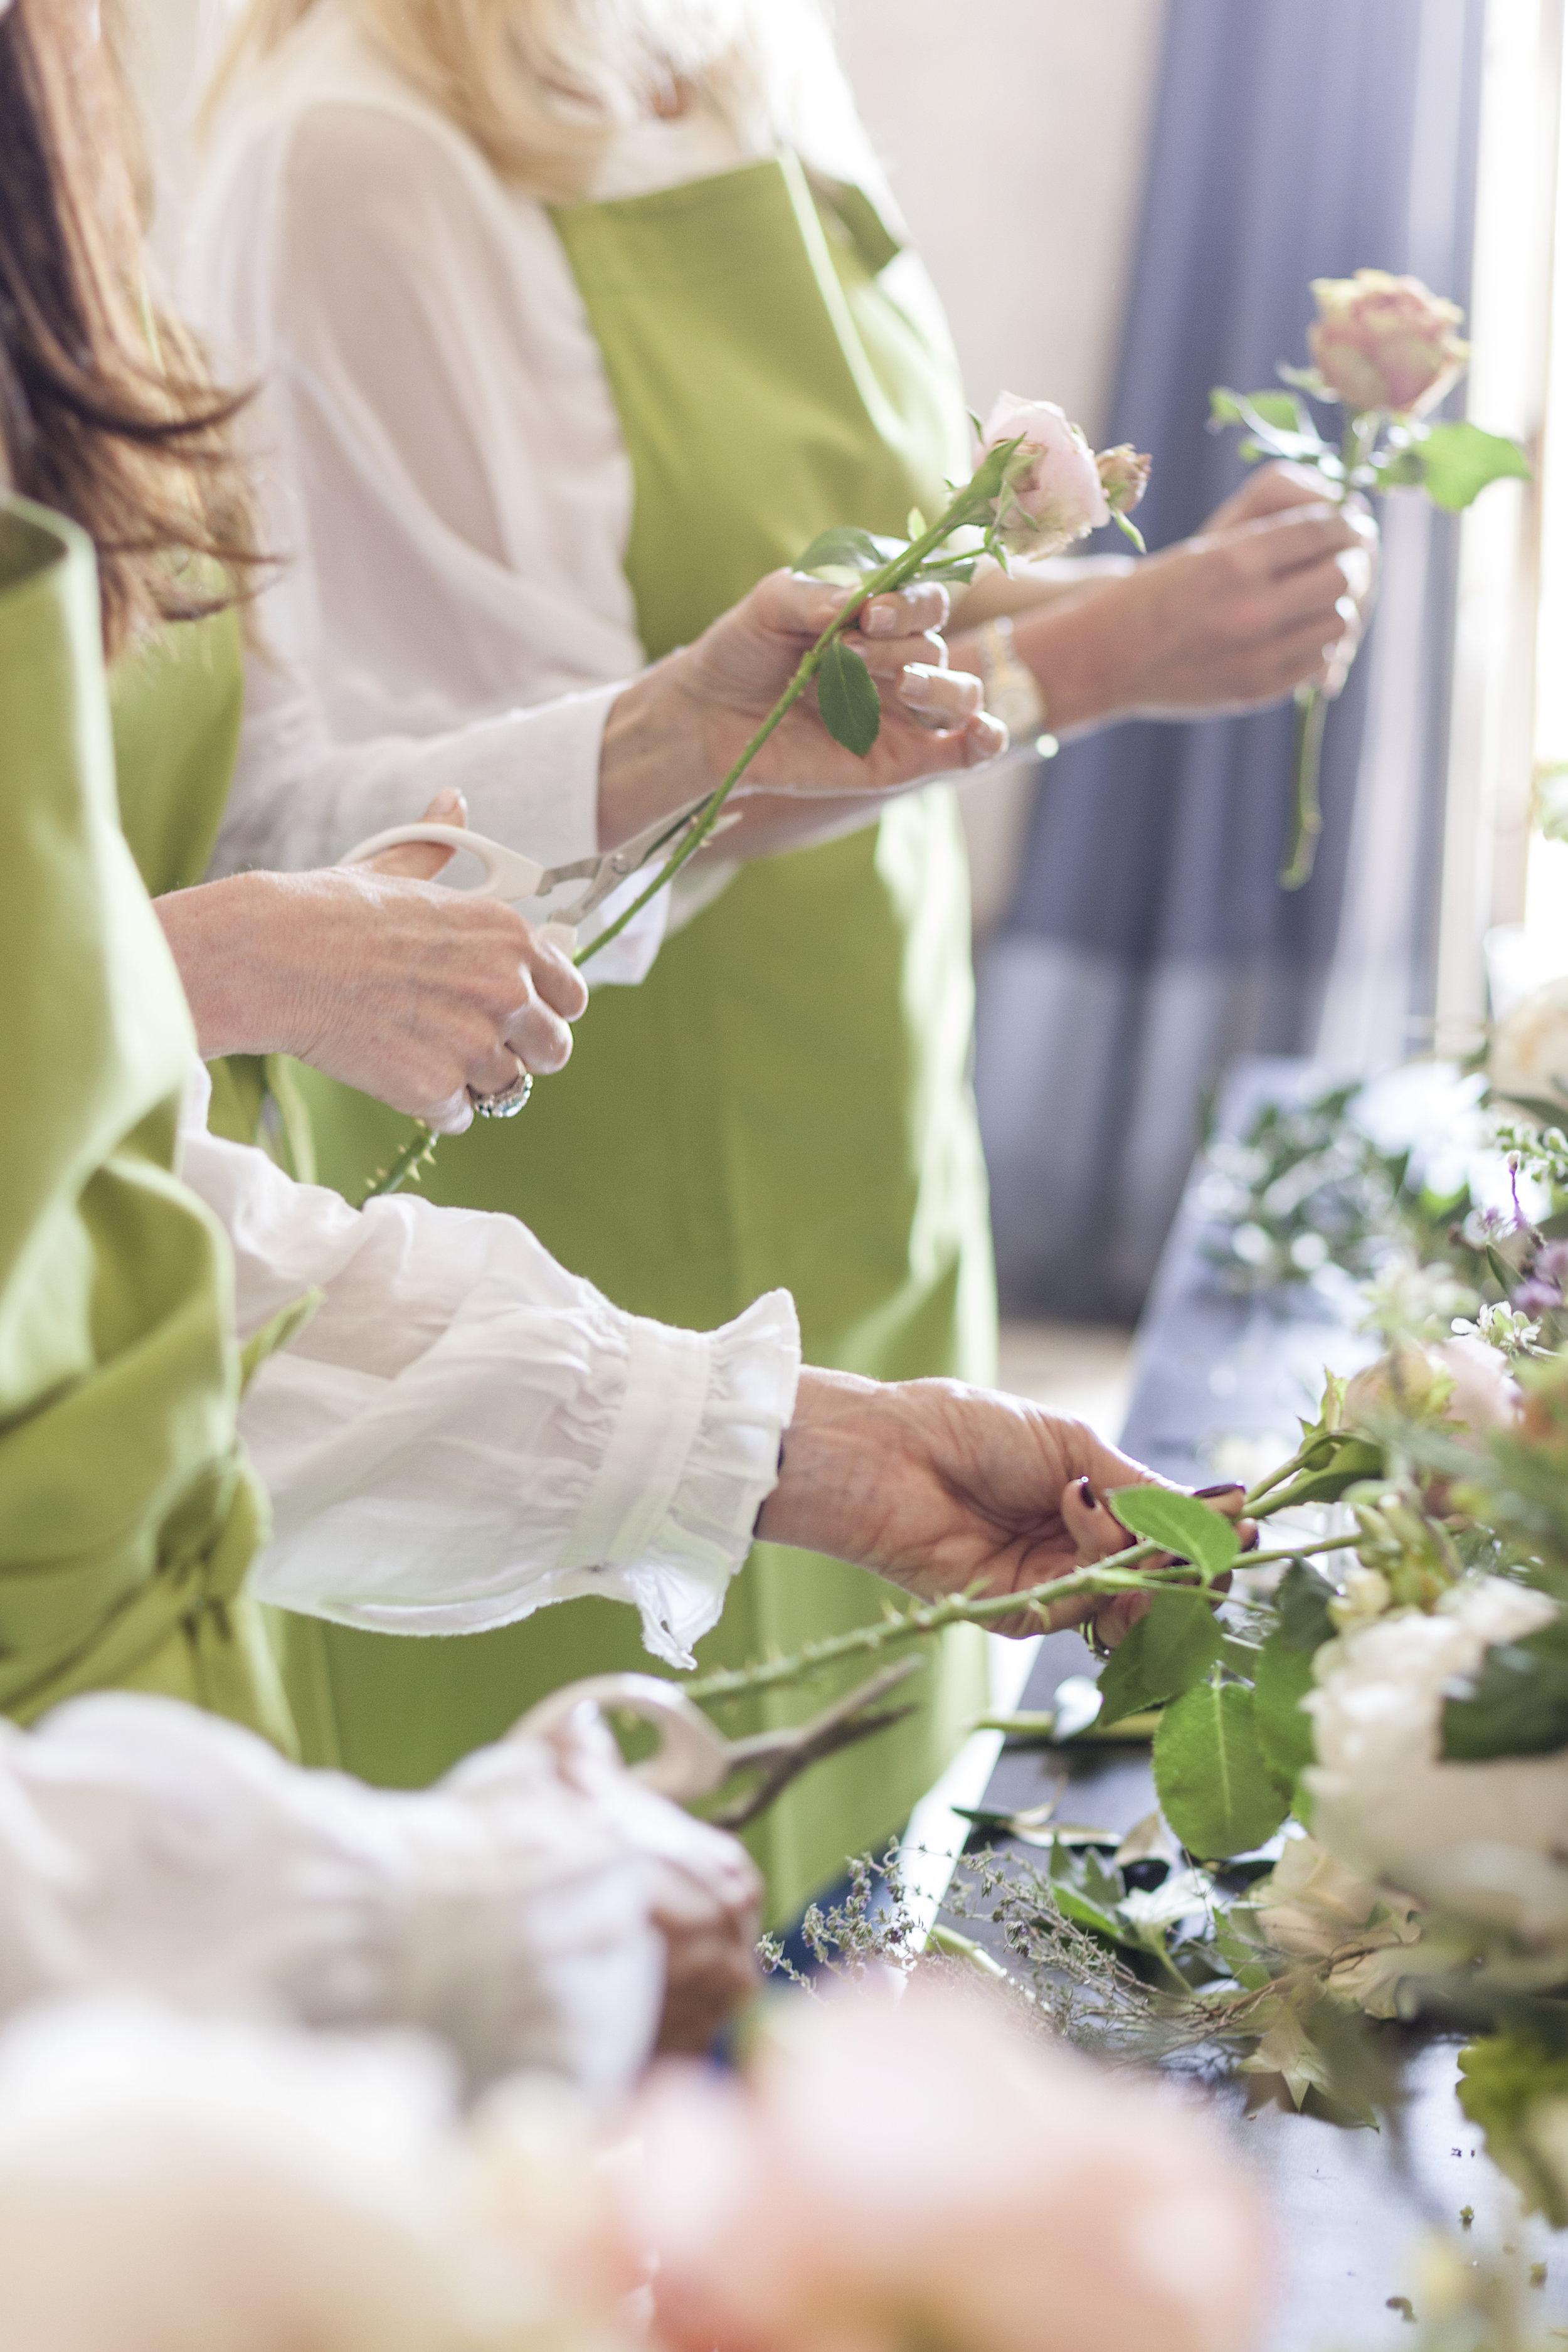 france-provence-floral-workshop-sandra-sigman-sharon-santoni (47).jpg